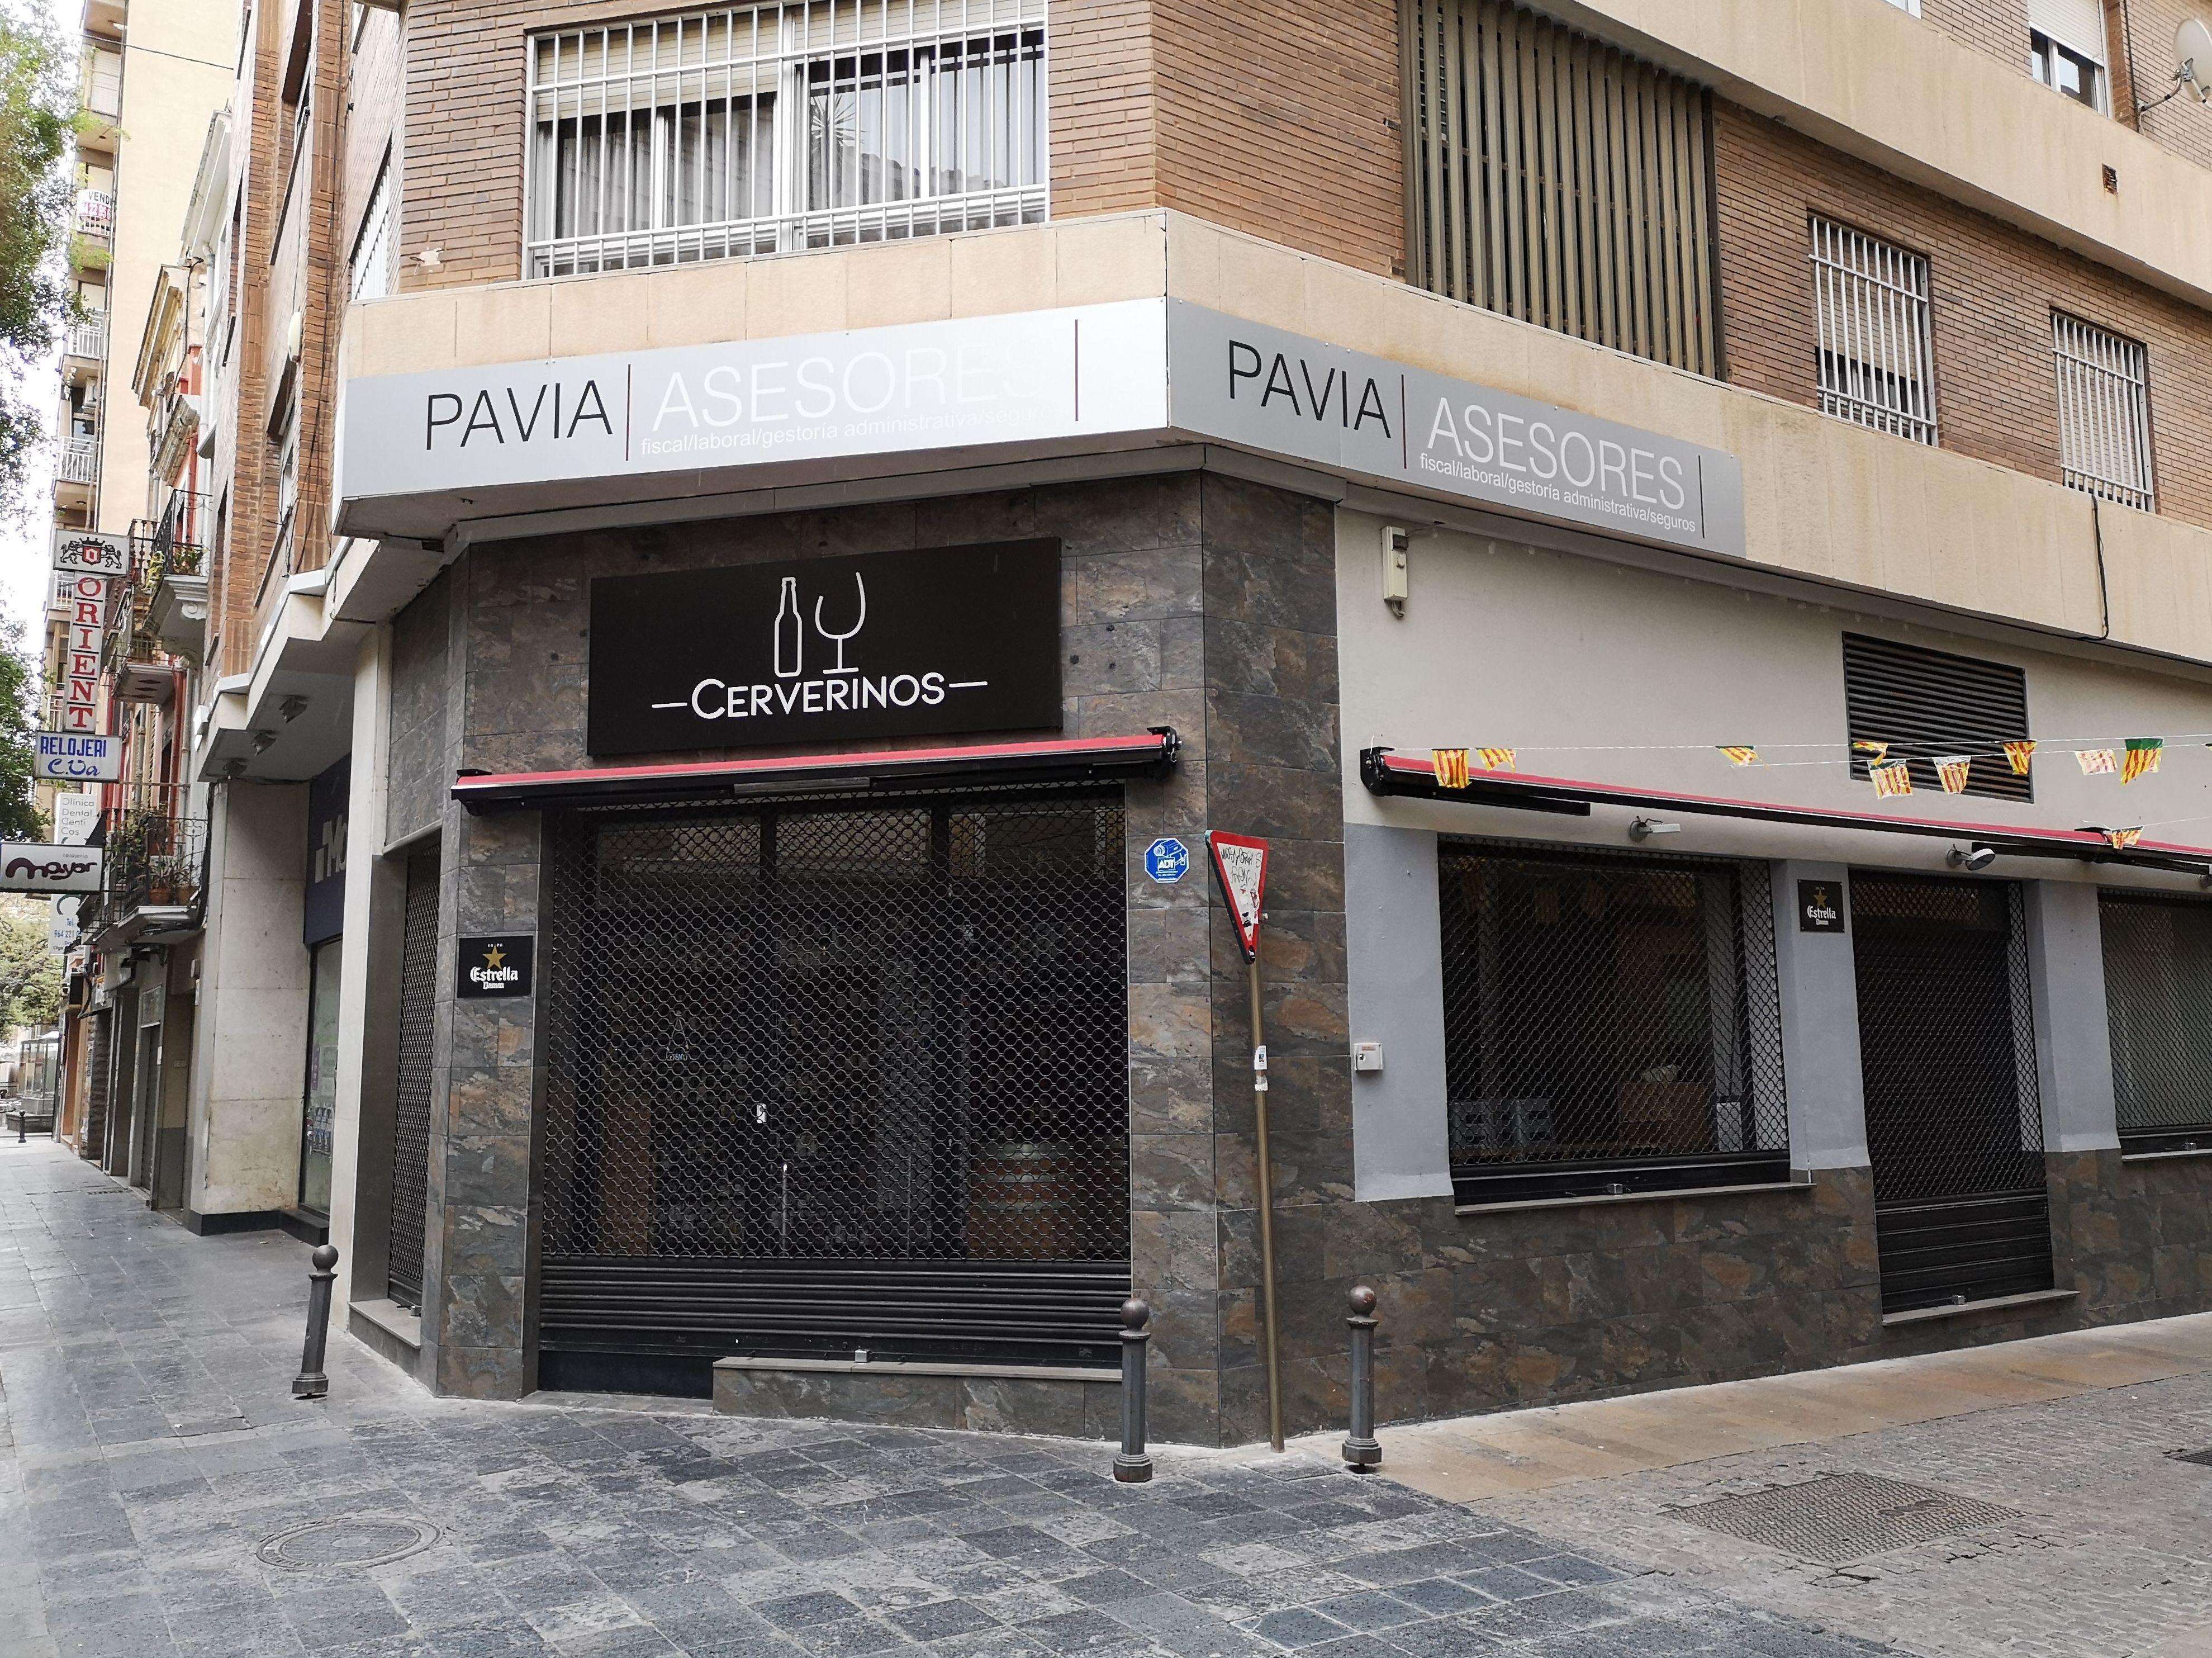 Pavia Asesores